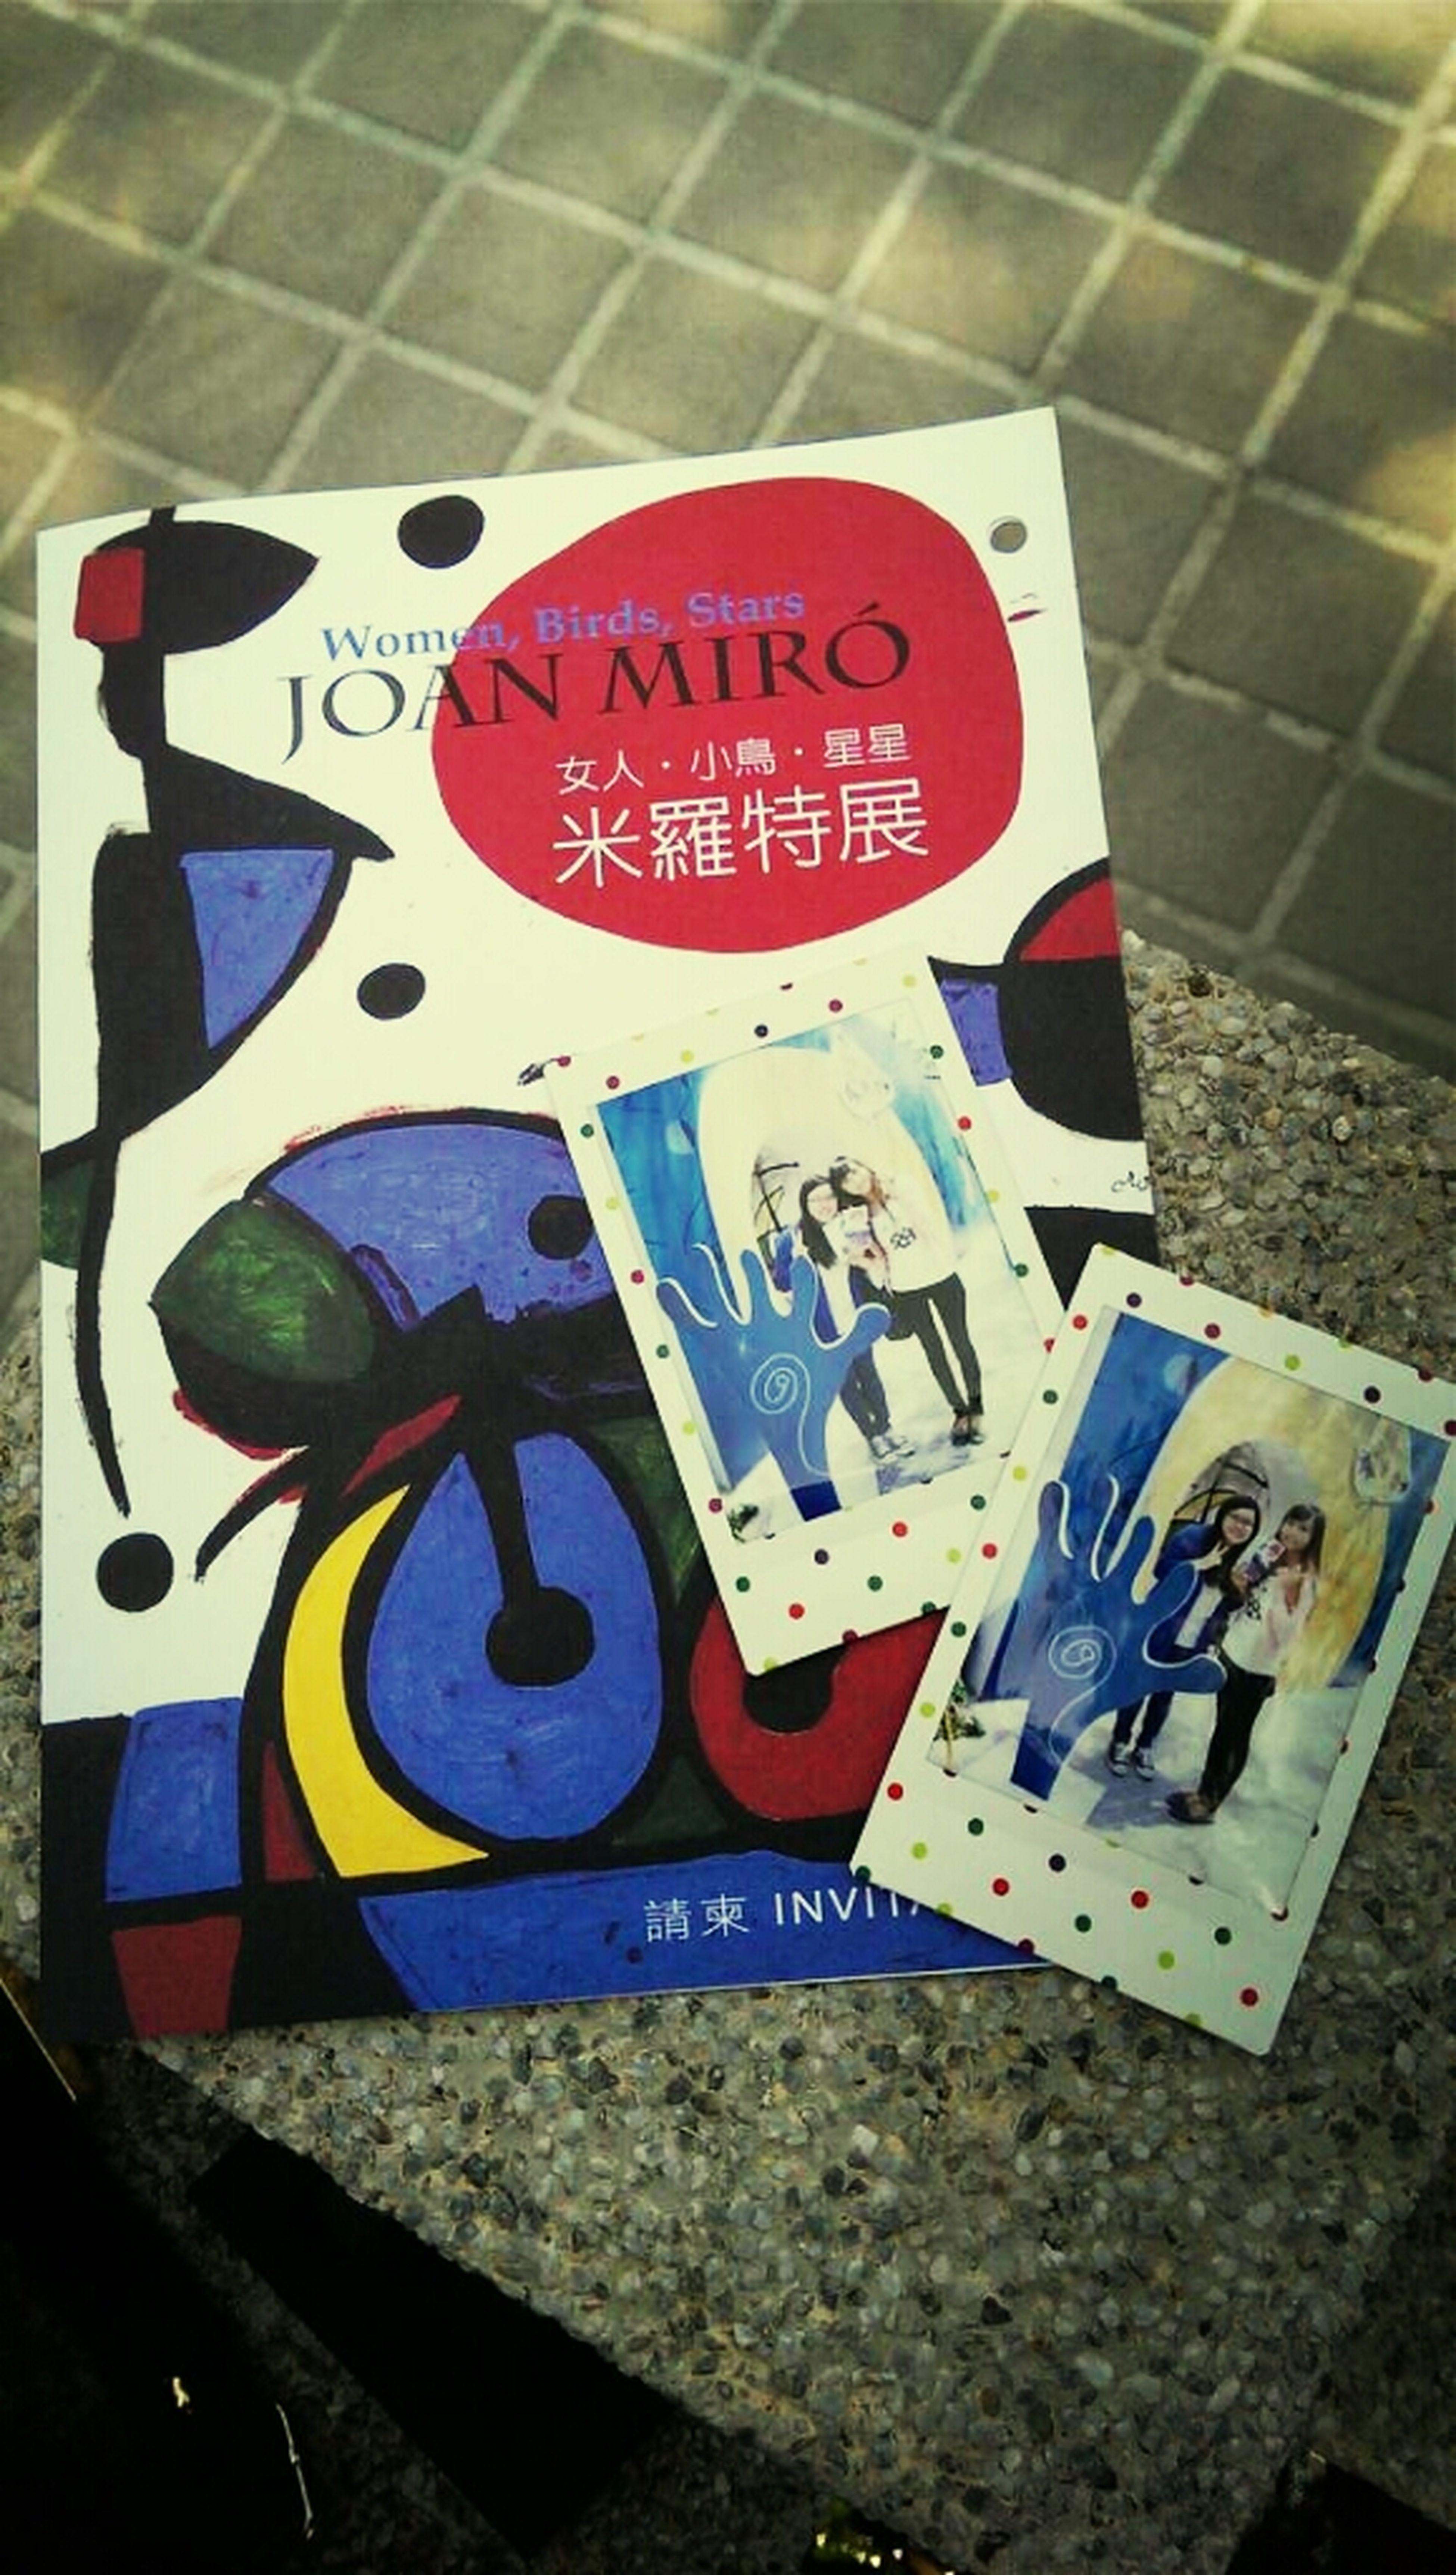 Exhibition Joan Miró  Women, Birds, Stars